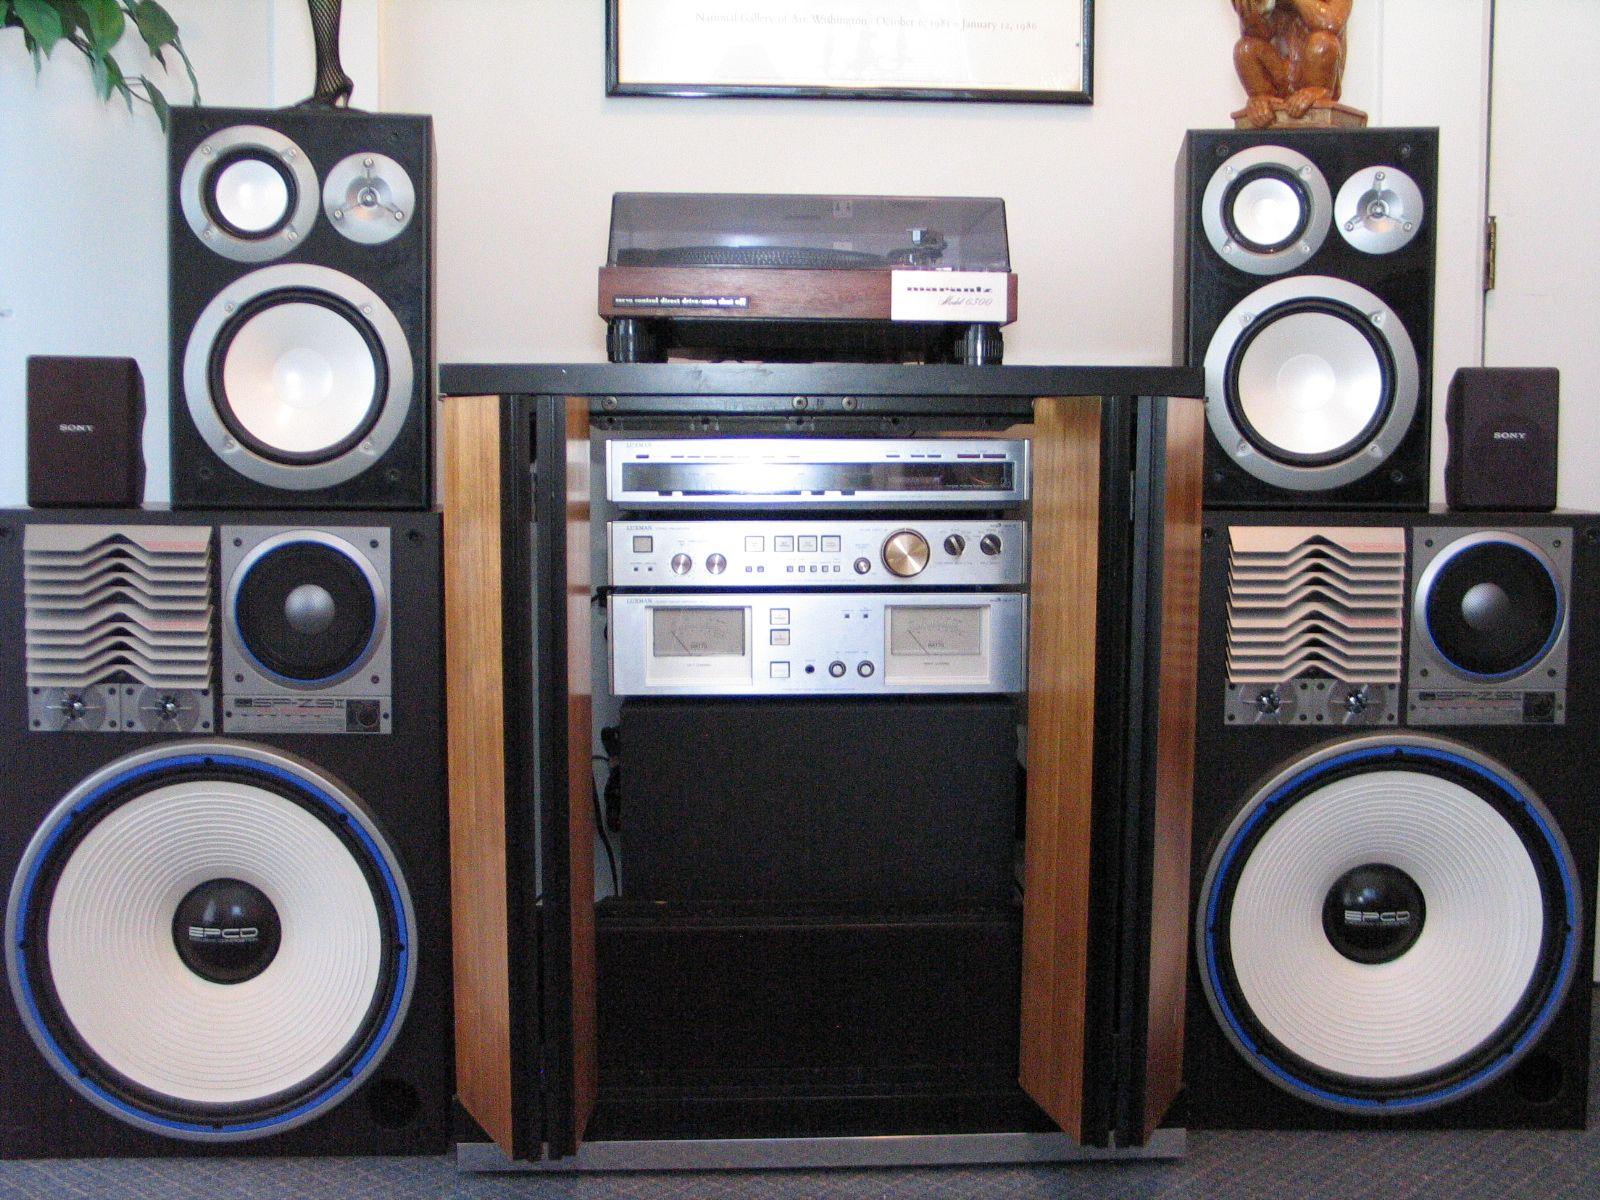 Sansui Sp Z9ii Vintage Speakers 300 Watt Rare Sexy Set Up Avan Av 801 Headset Headphone